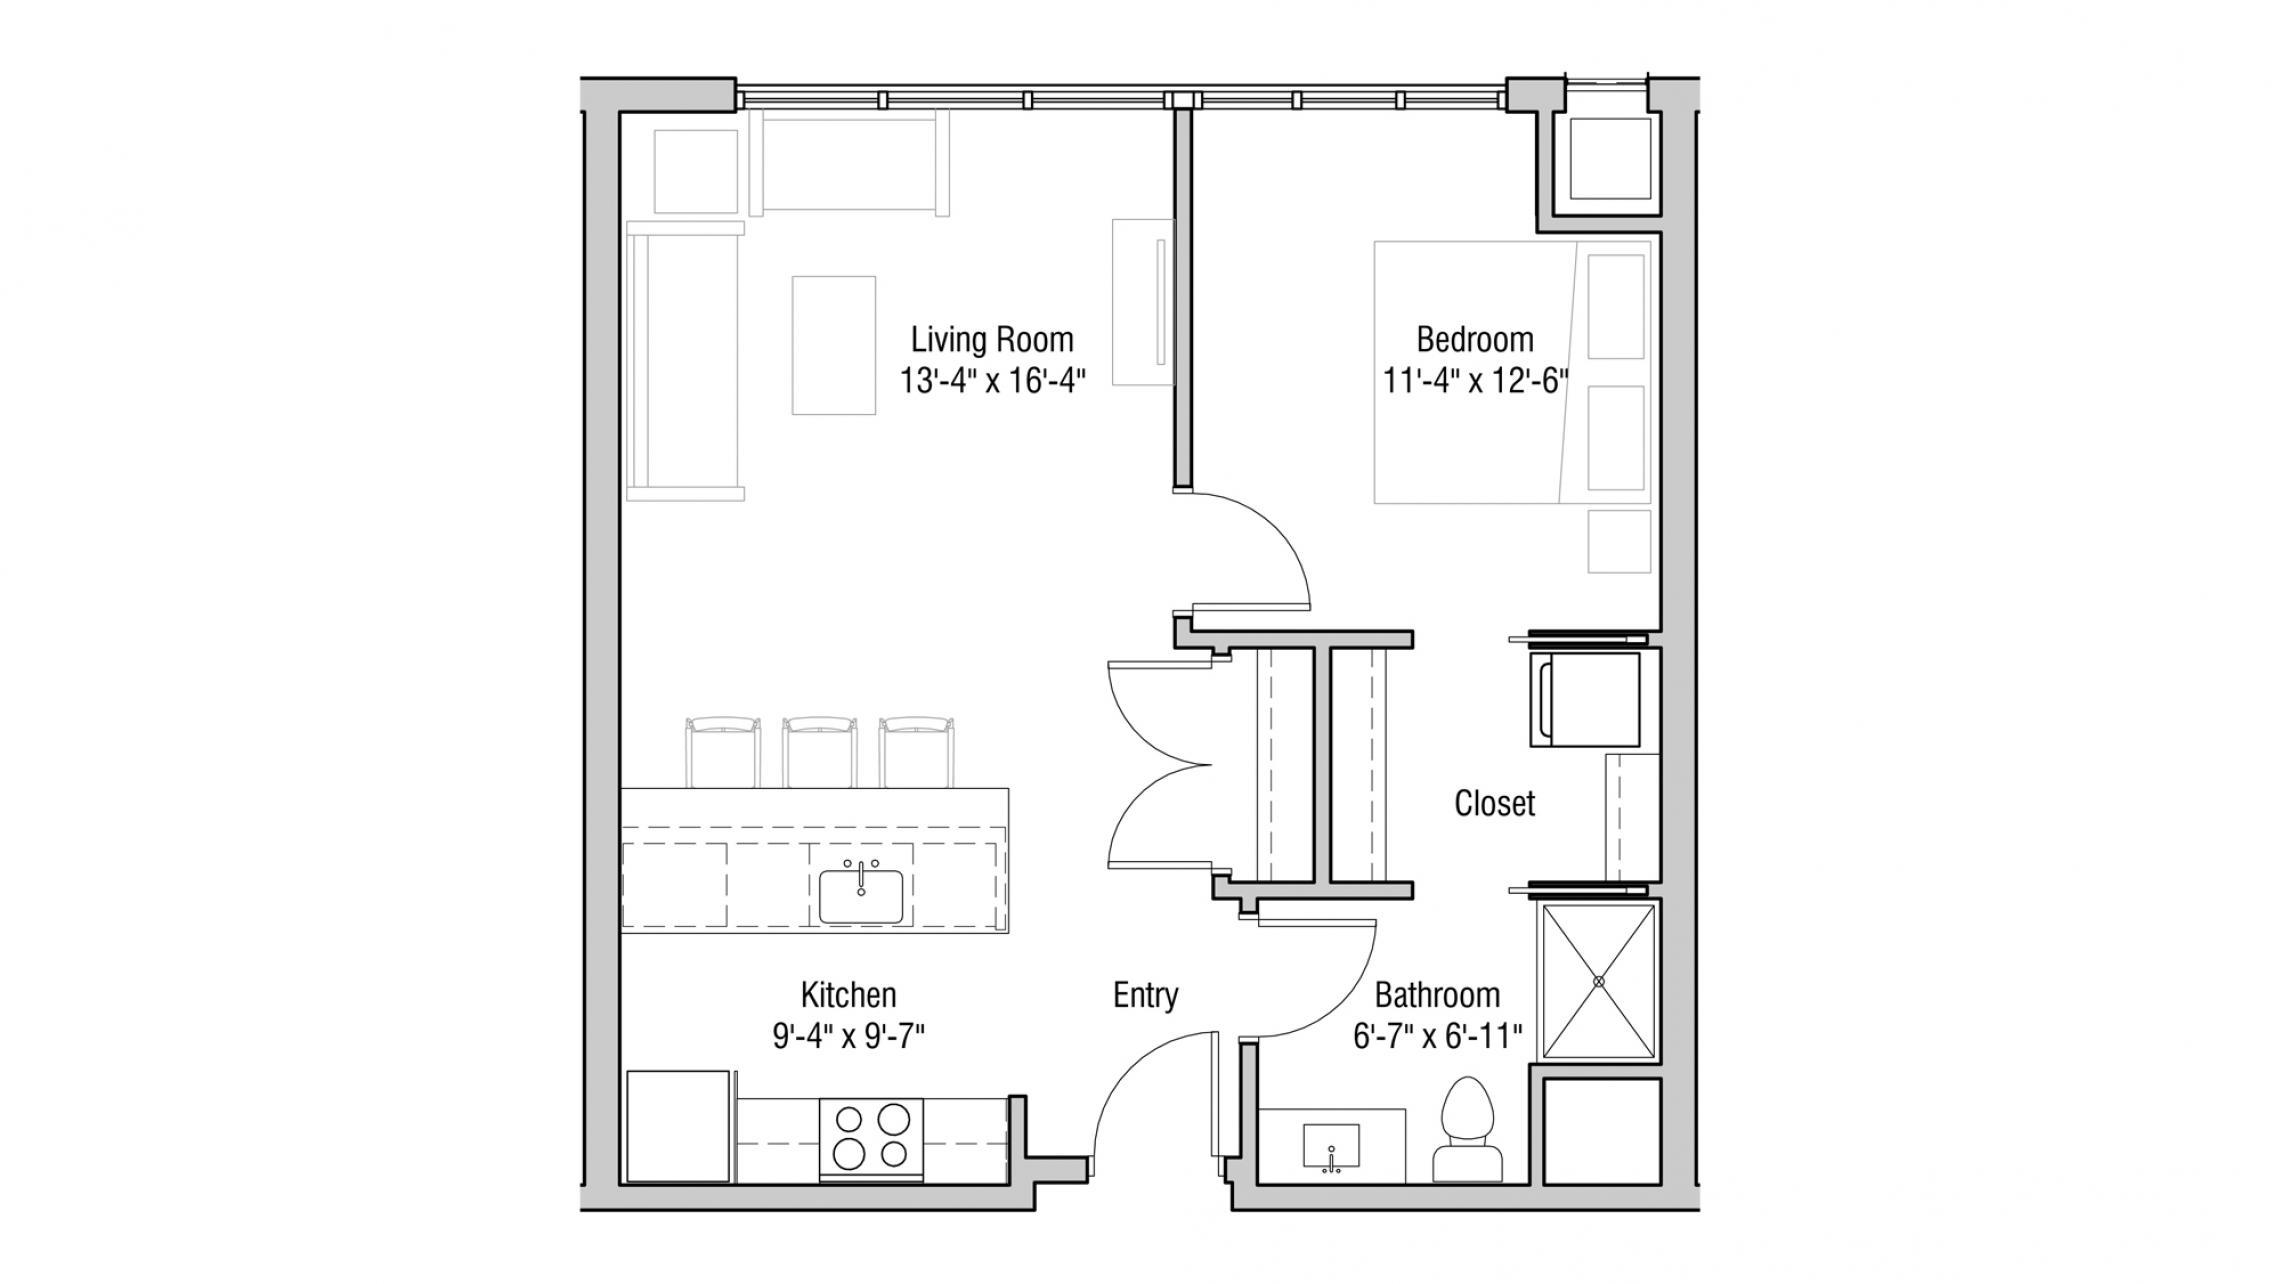 ULI Quarter Row 323 - One Bedroom, One Bathroom